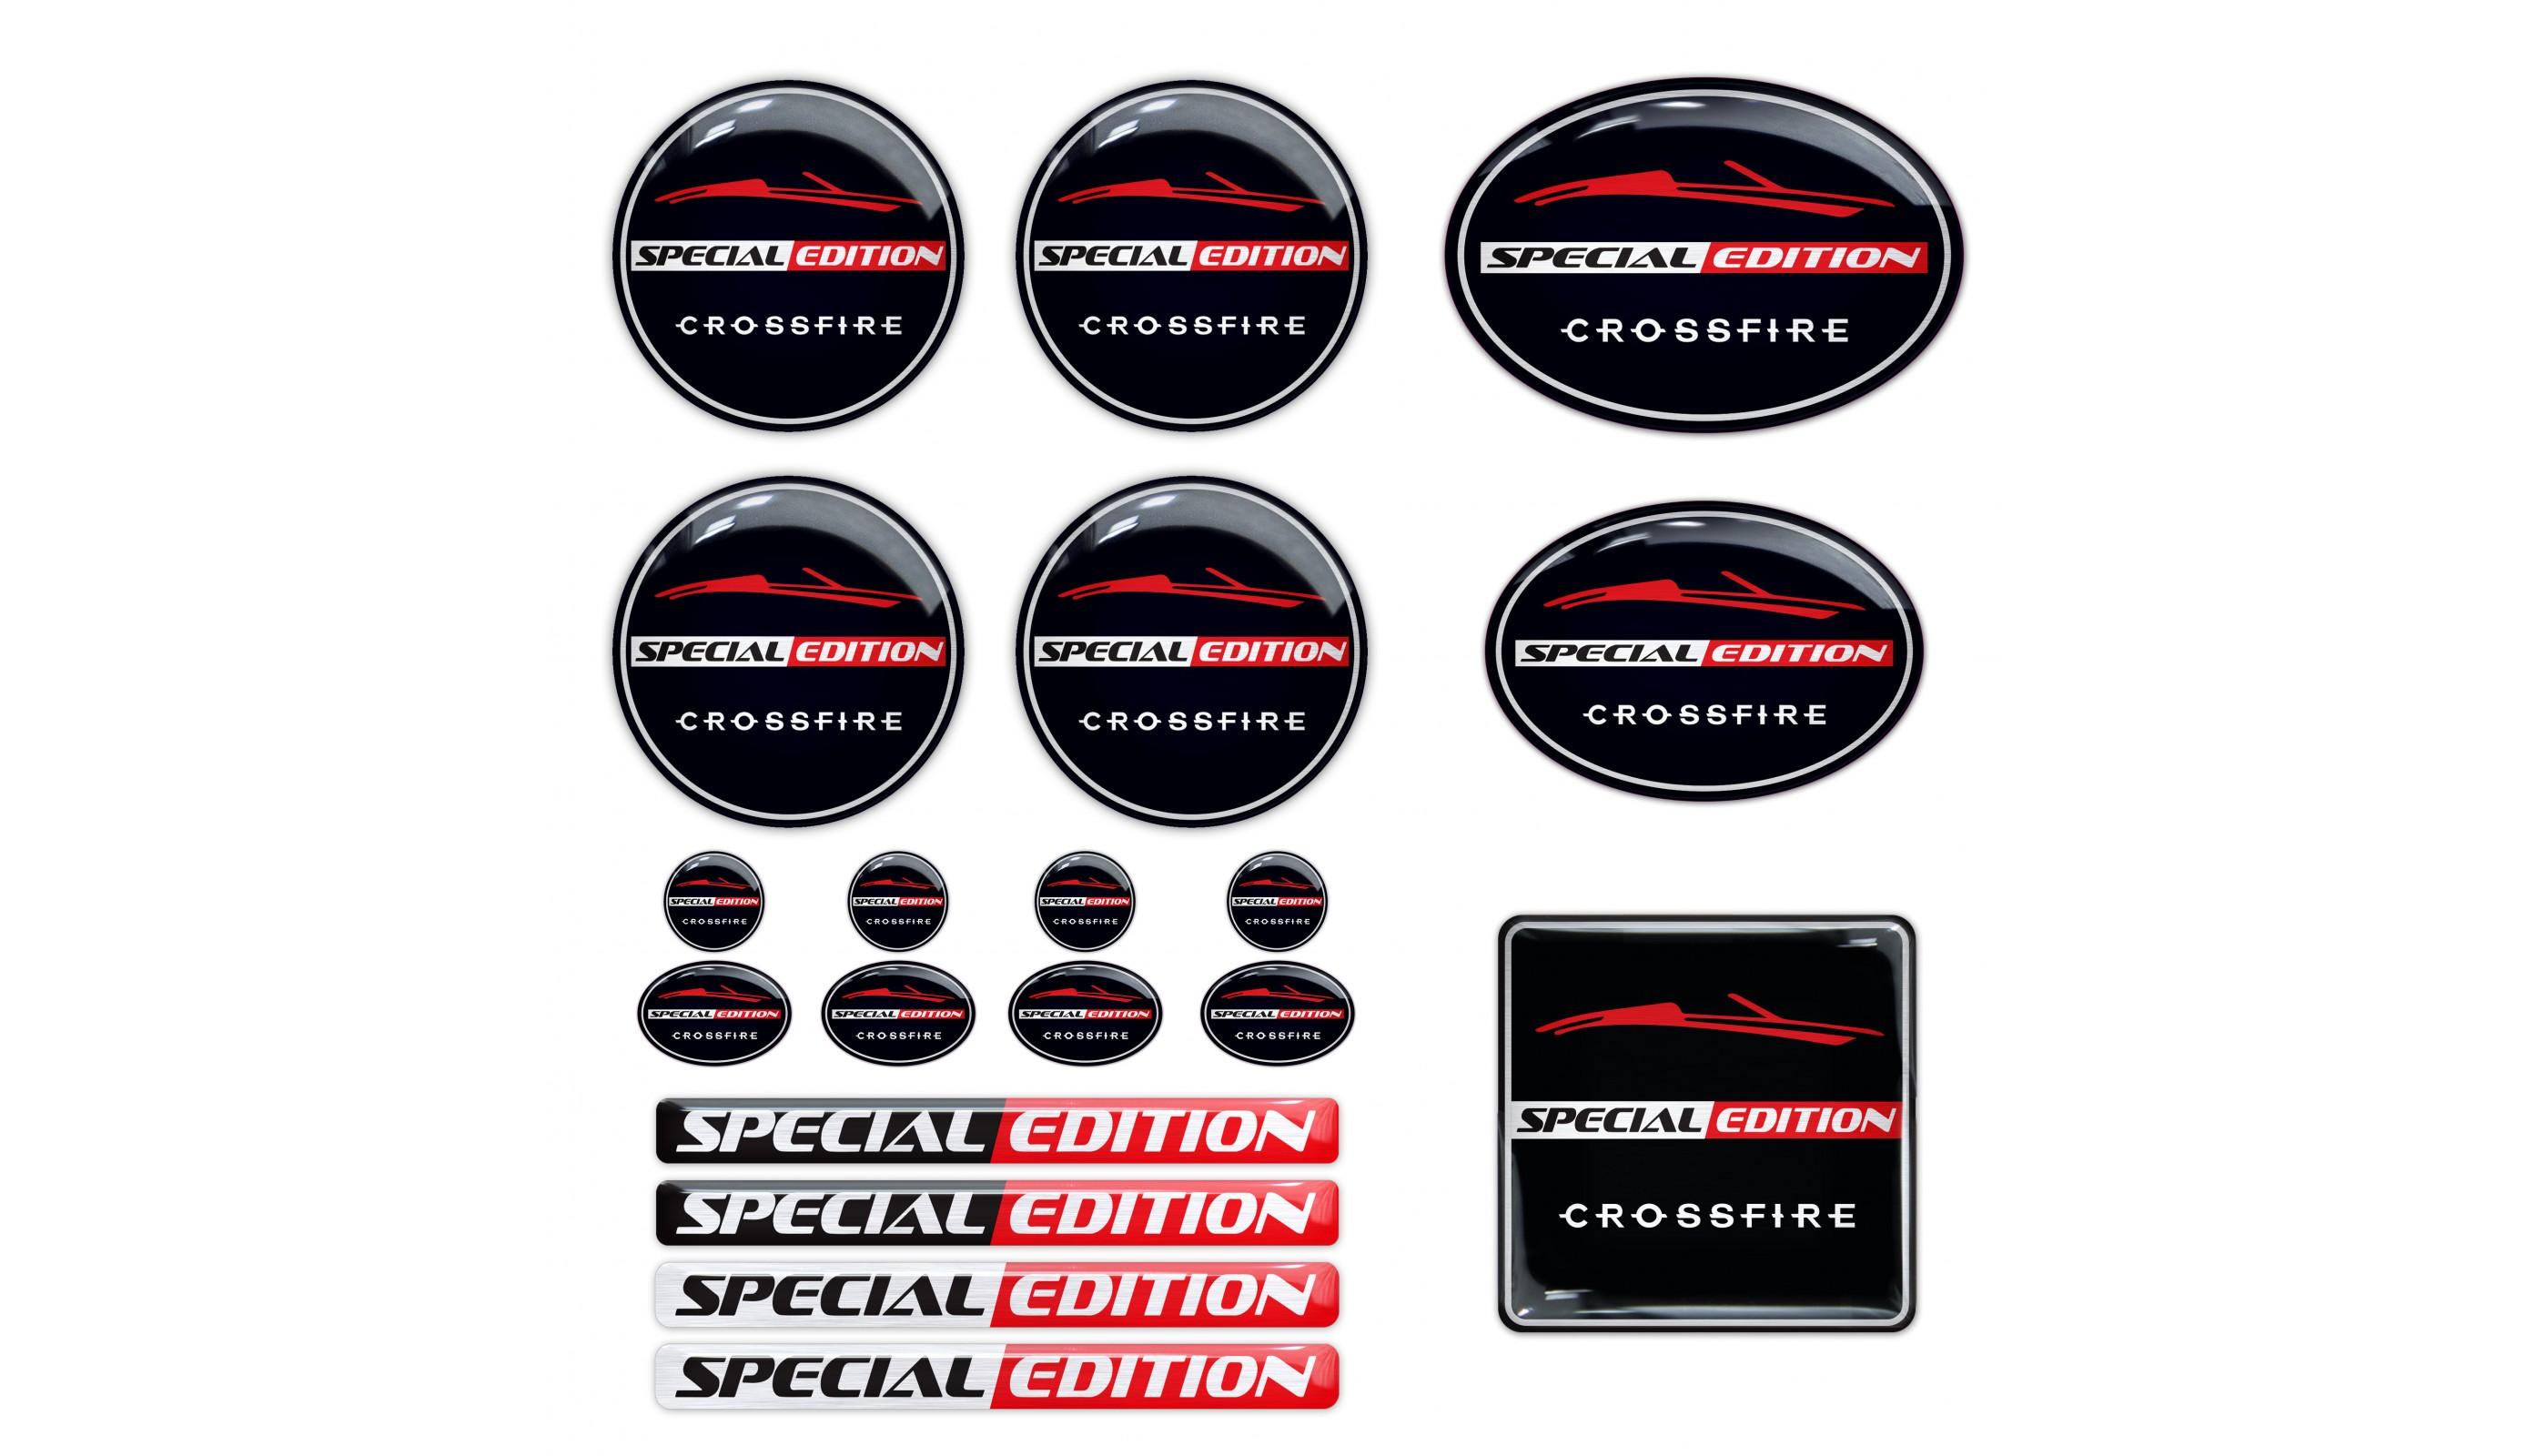 Special Edition Limited 3d emblem decal sticker Chrysler BMW VW Mercedes